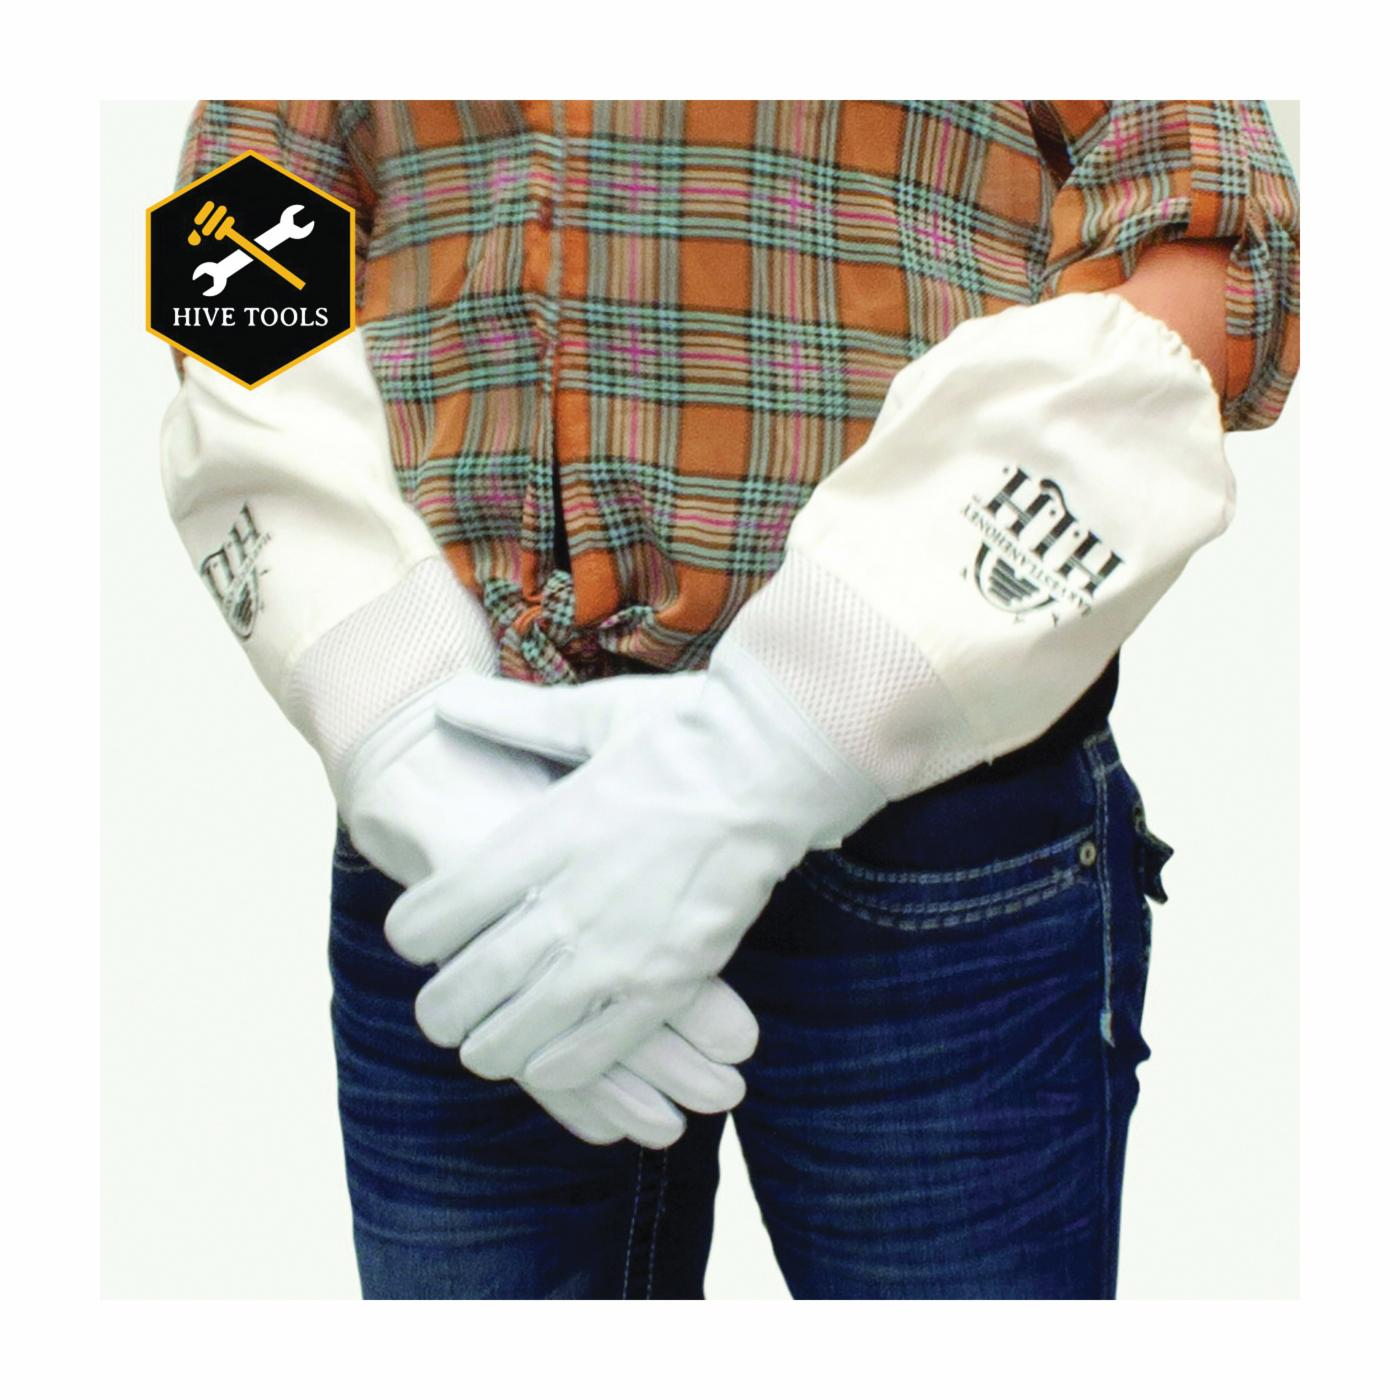 HARVEST LANE HONEY CLOTHGS-103